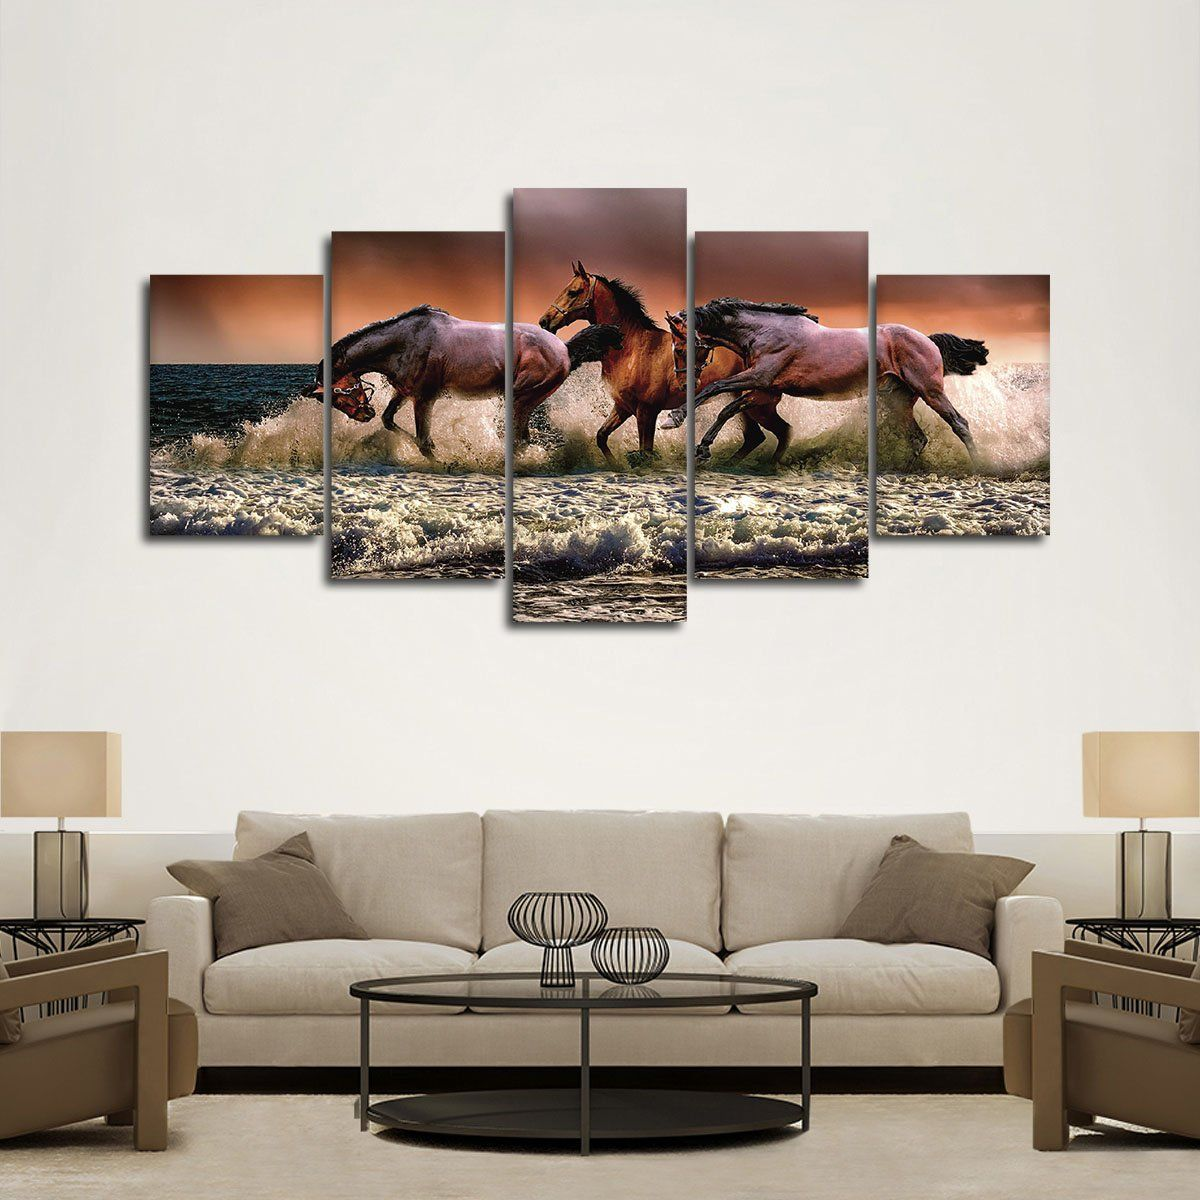 Epic Mustang Horses Wall Art Horse Wall Art Canvas Wall Art Animal Wall Art